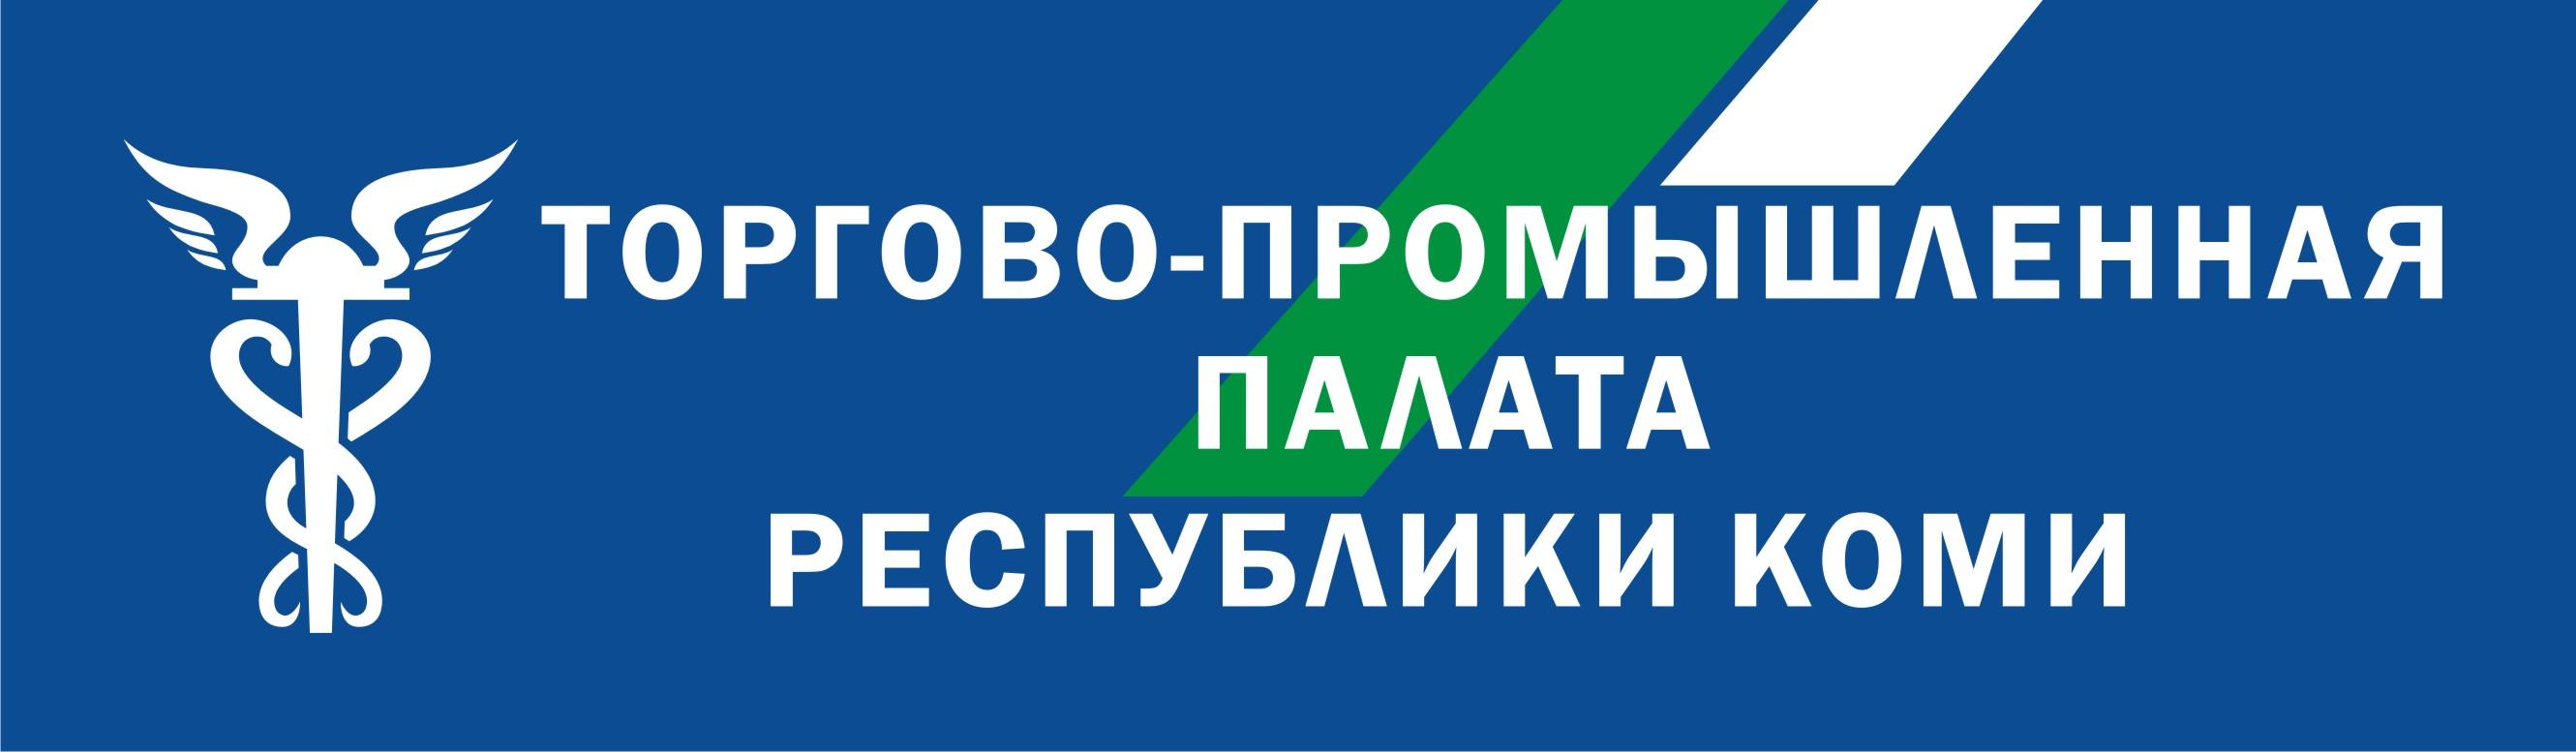 ТПП Республики Коми